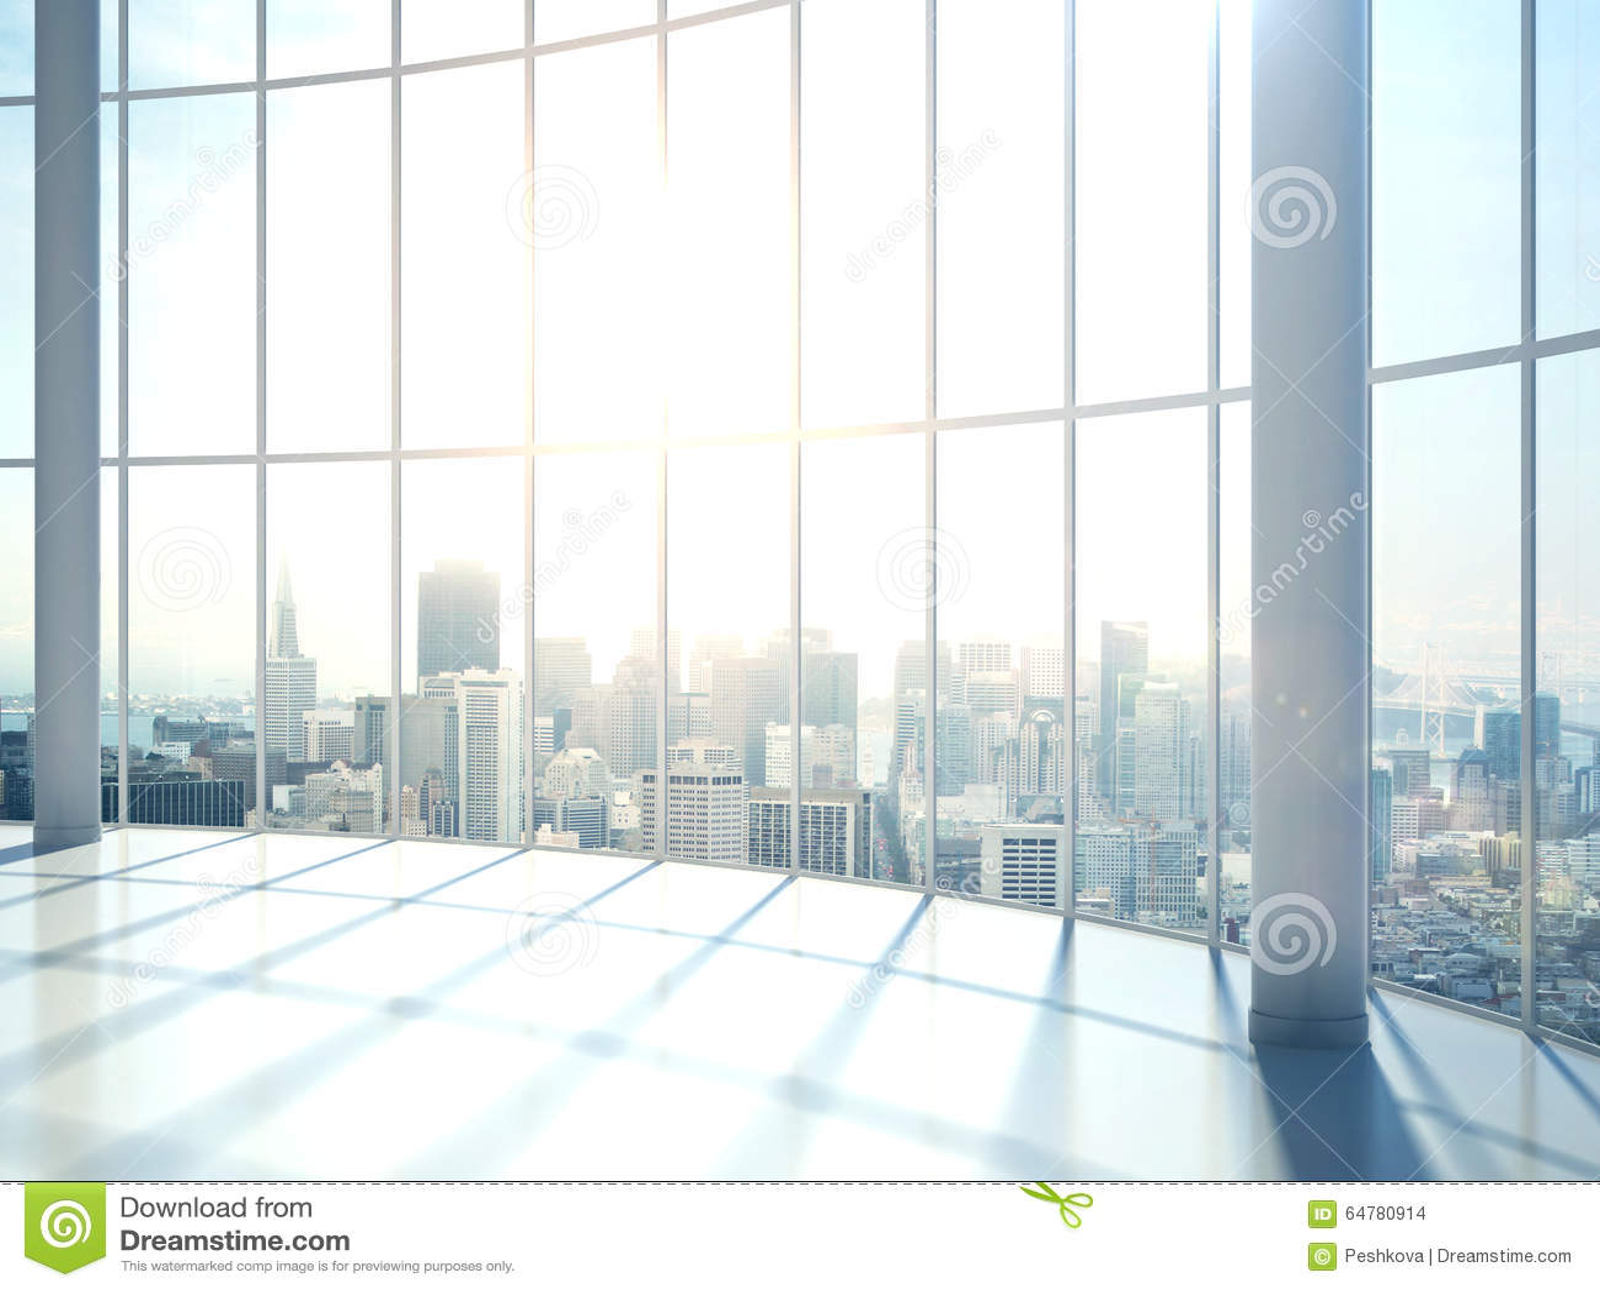 Fenster innenraum  Innenraum Mit Großem Fenster Stock Abbildung - Bild: 64780914